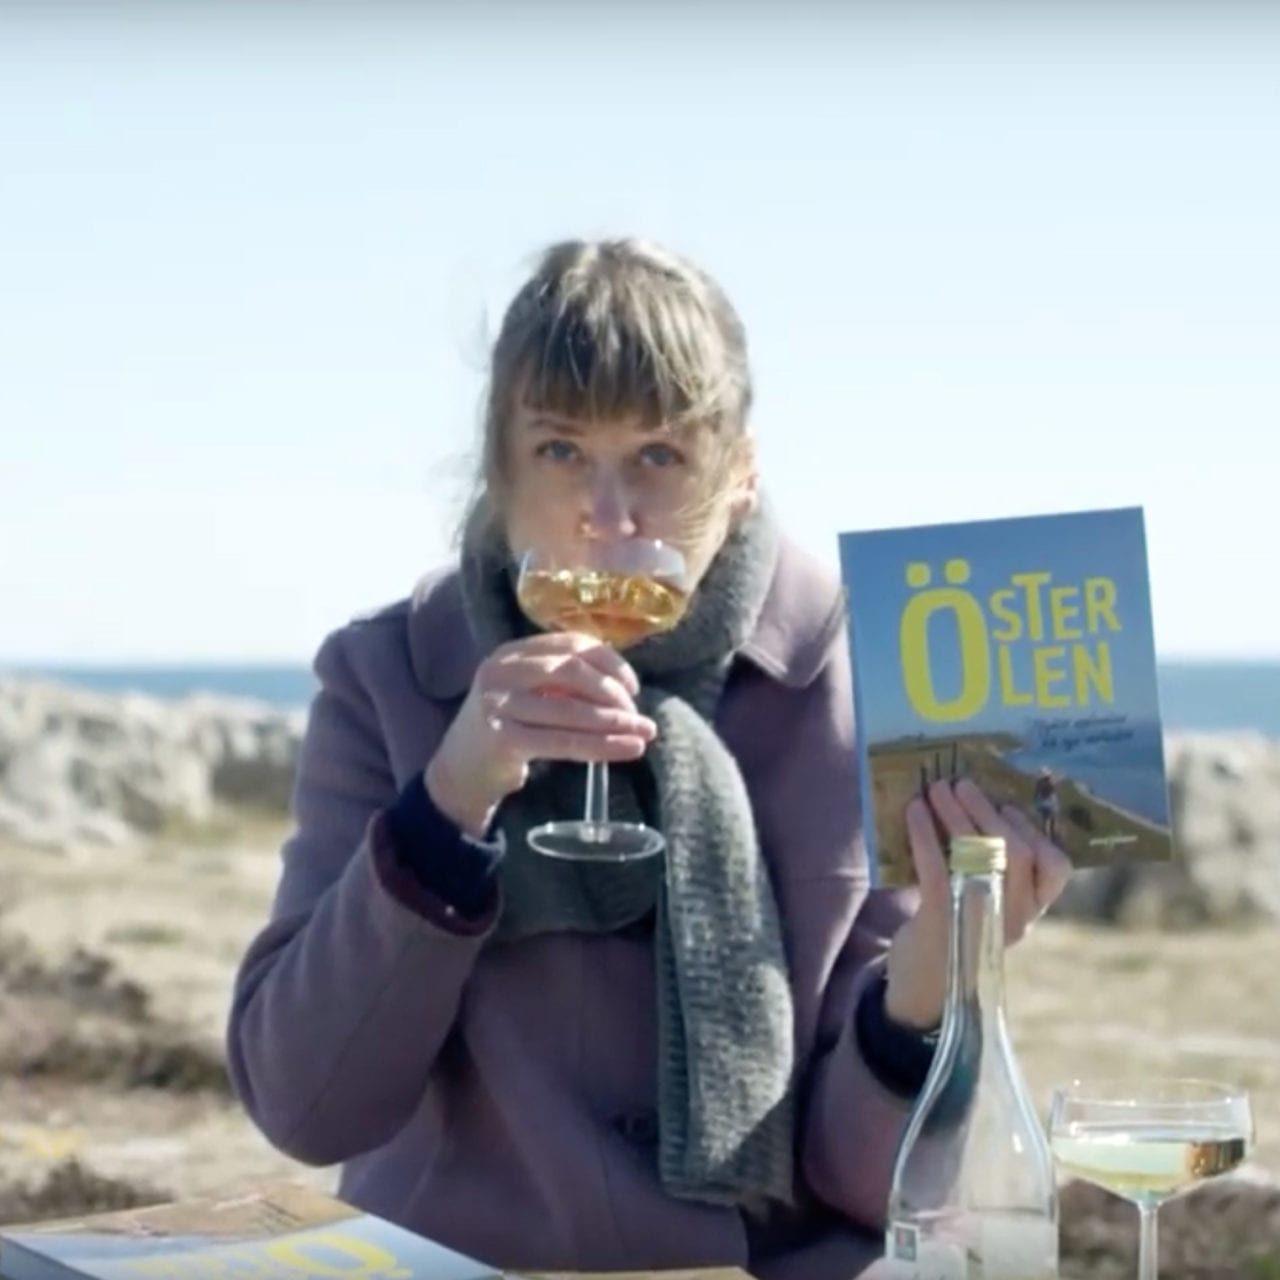 Caroline Alesmark skålar i ciderbubbel